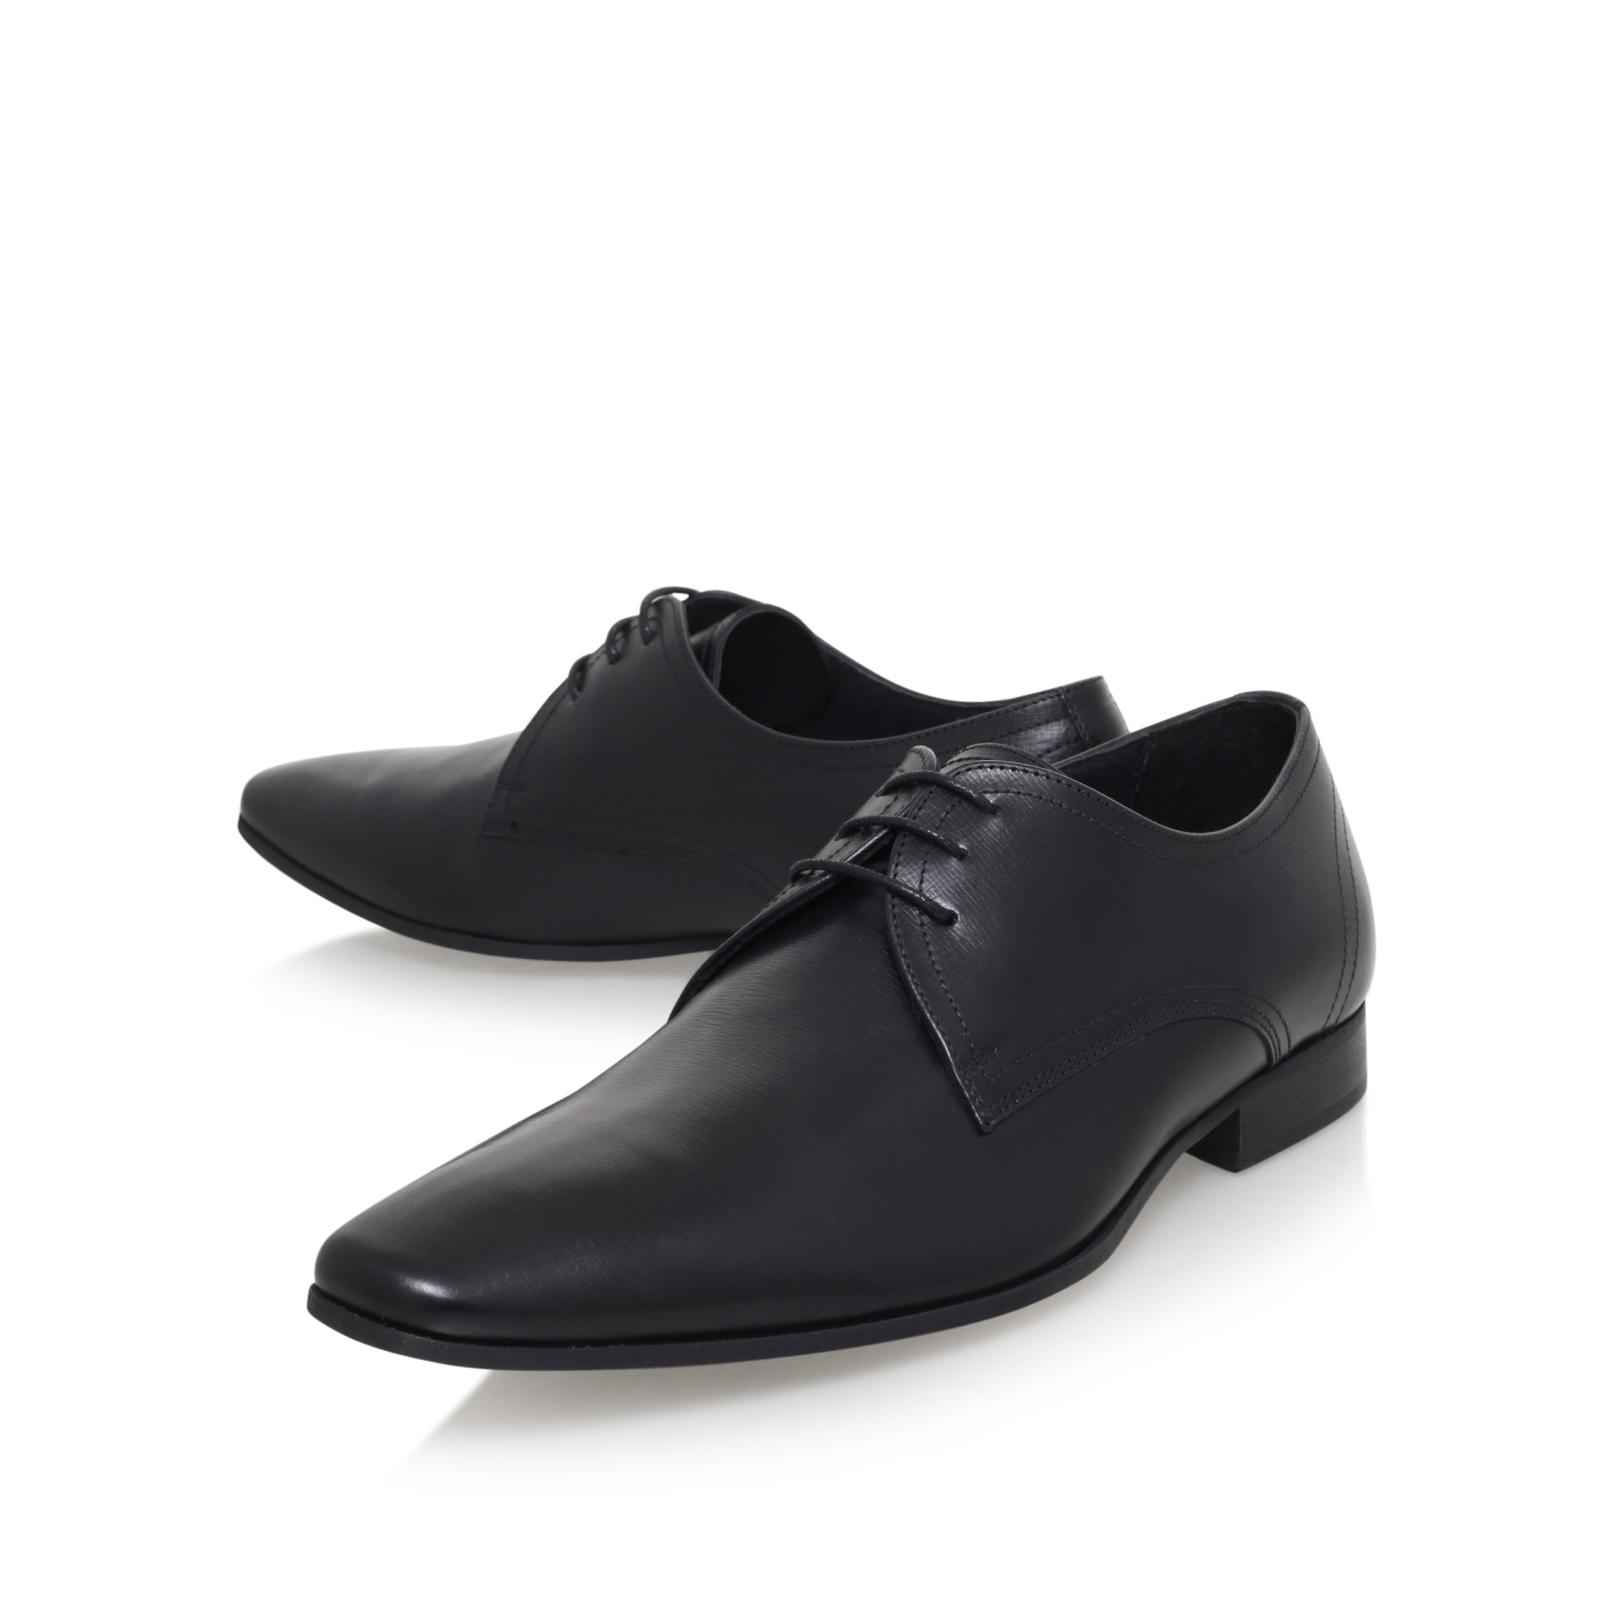 santon kg by kurt geiger santon black leather formal shoes